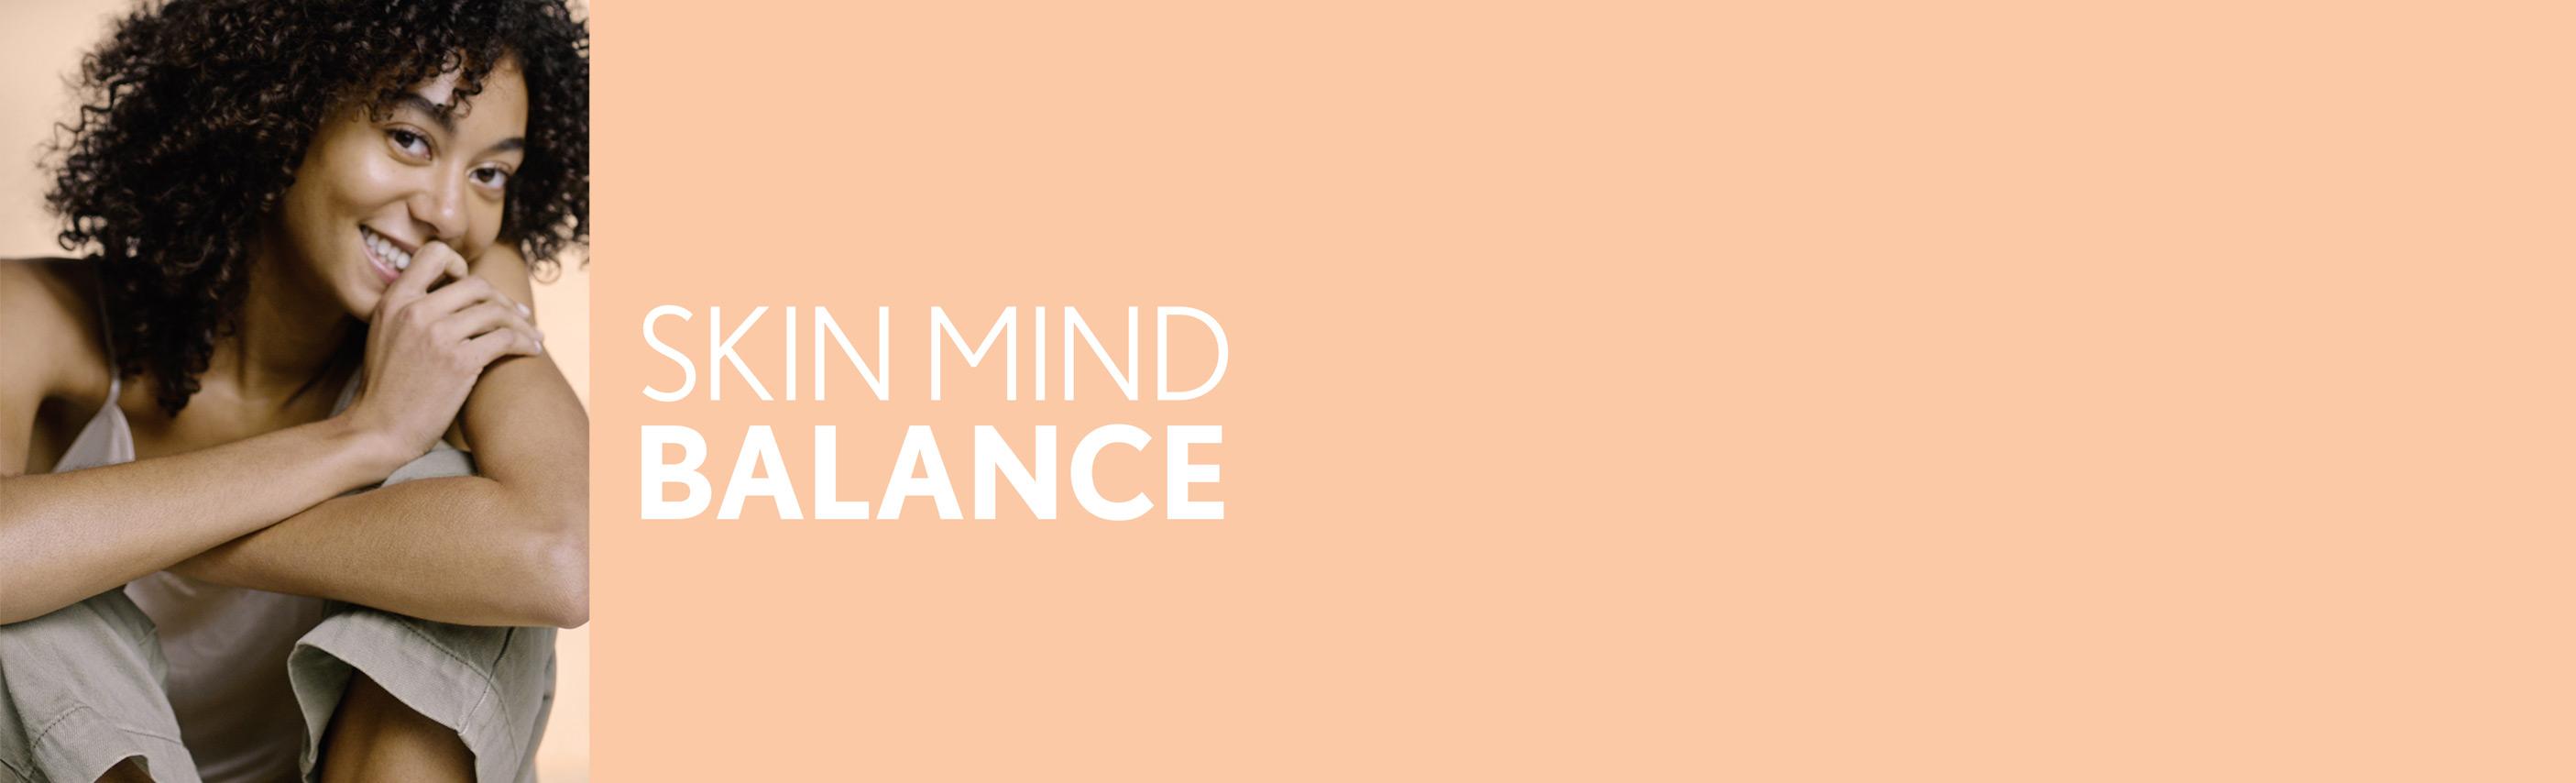 Skin-Mind-Balance-Homepage-Banner